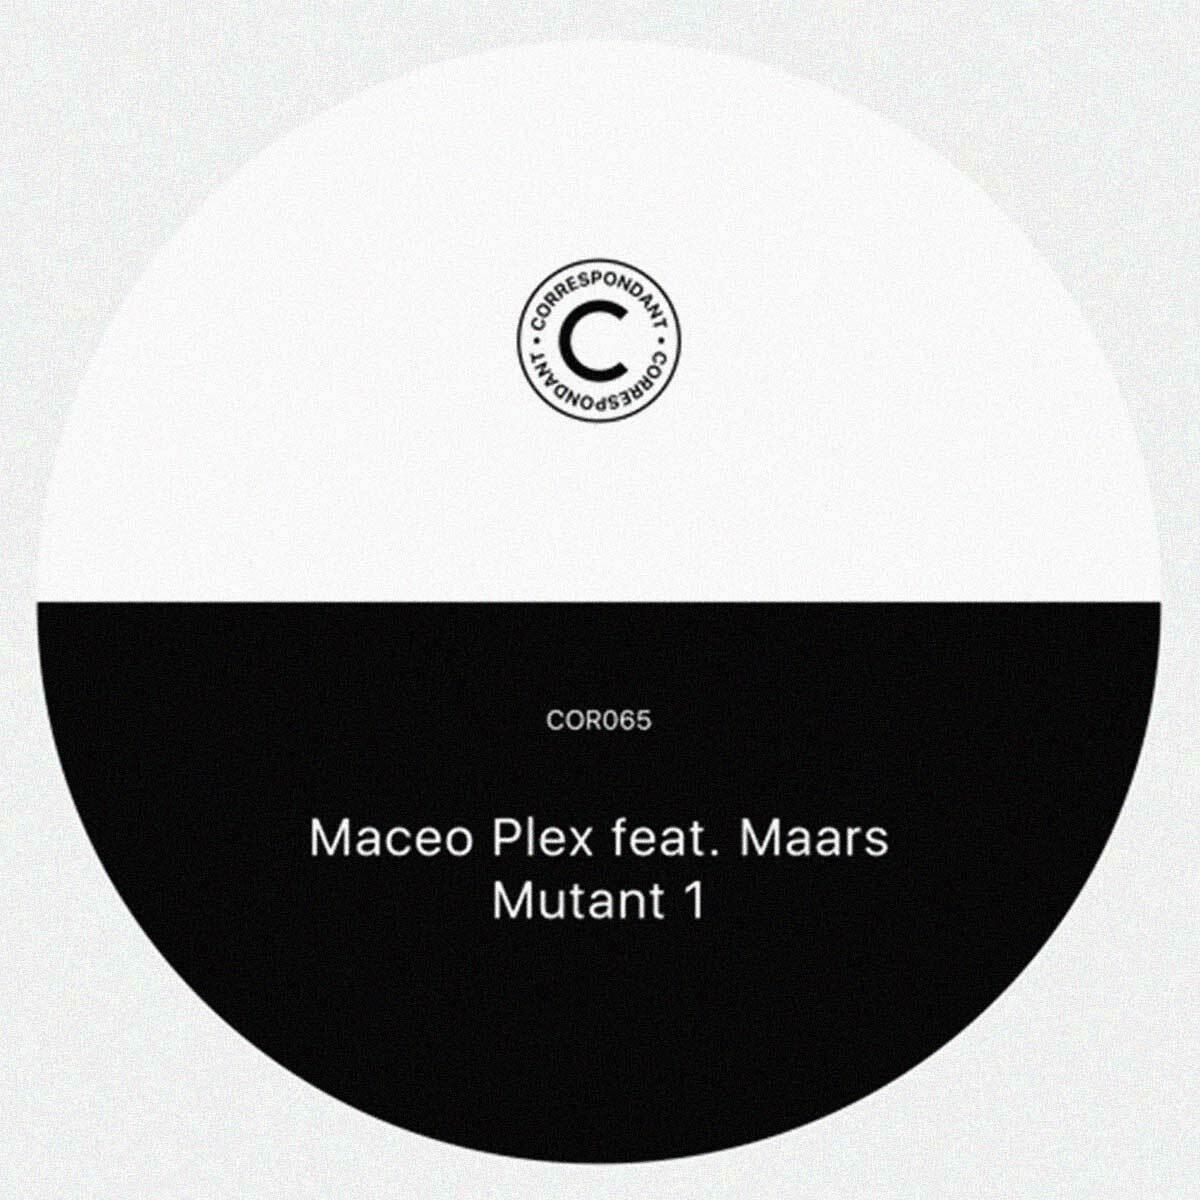 Maceo Plex – Mutant 1 (Correspondant)